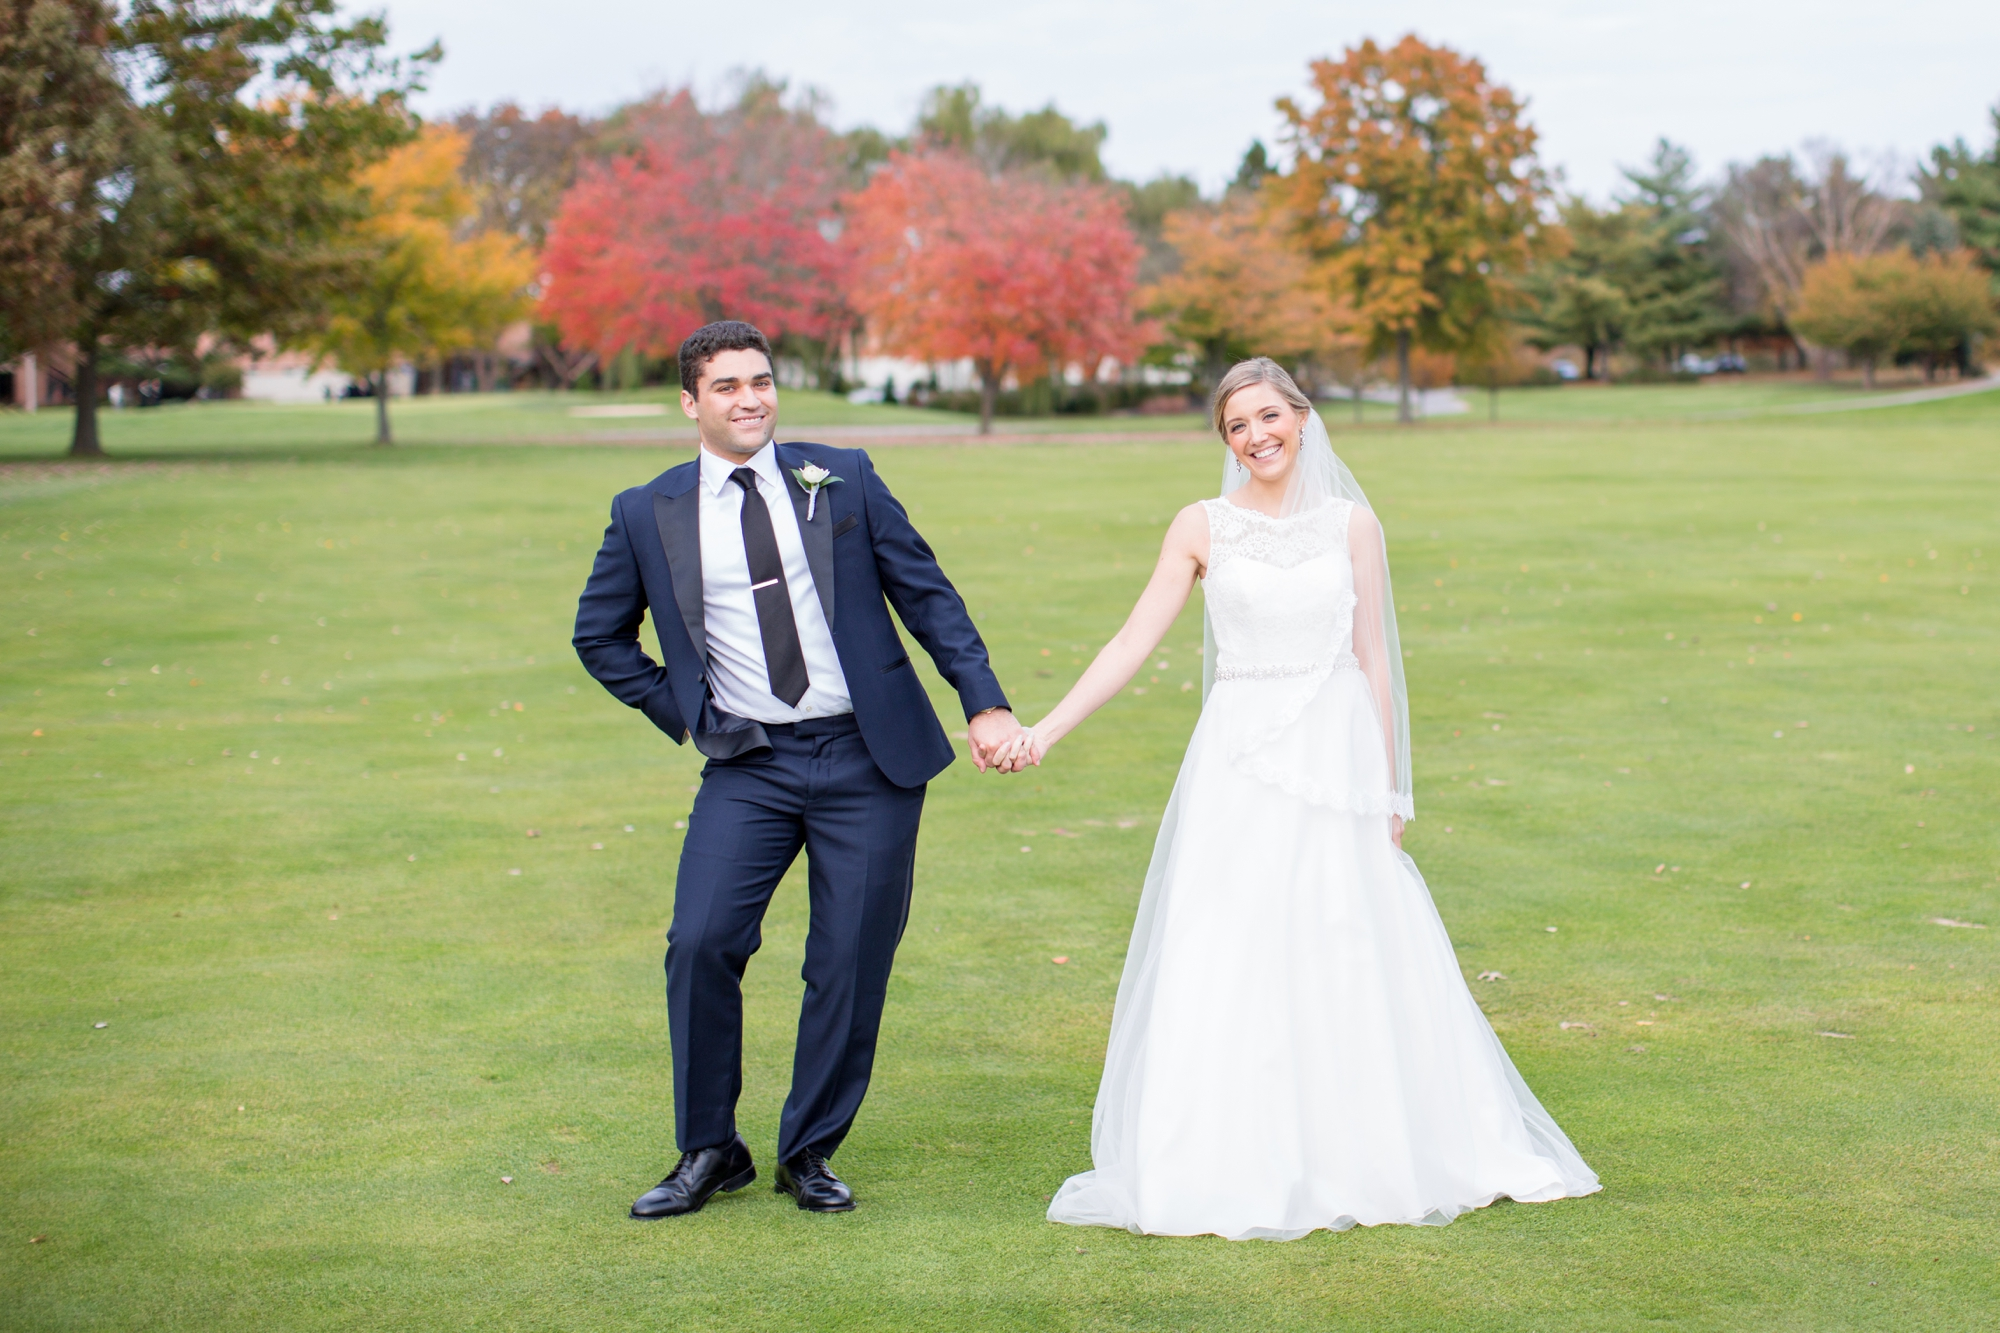 2-Finkel Wedding Bride & Groom Portraits-366_anna grace photography maryland wedding photographer turf valley.jpg